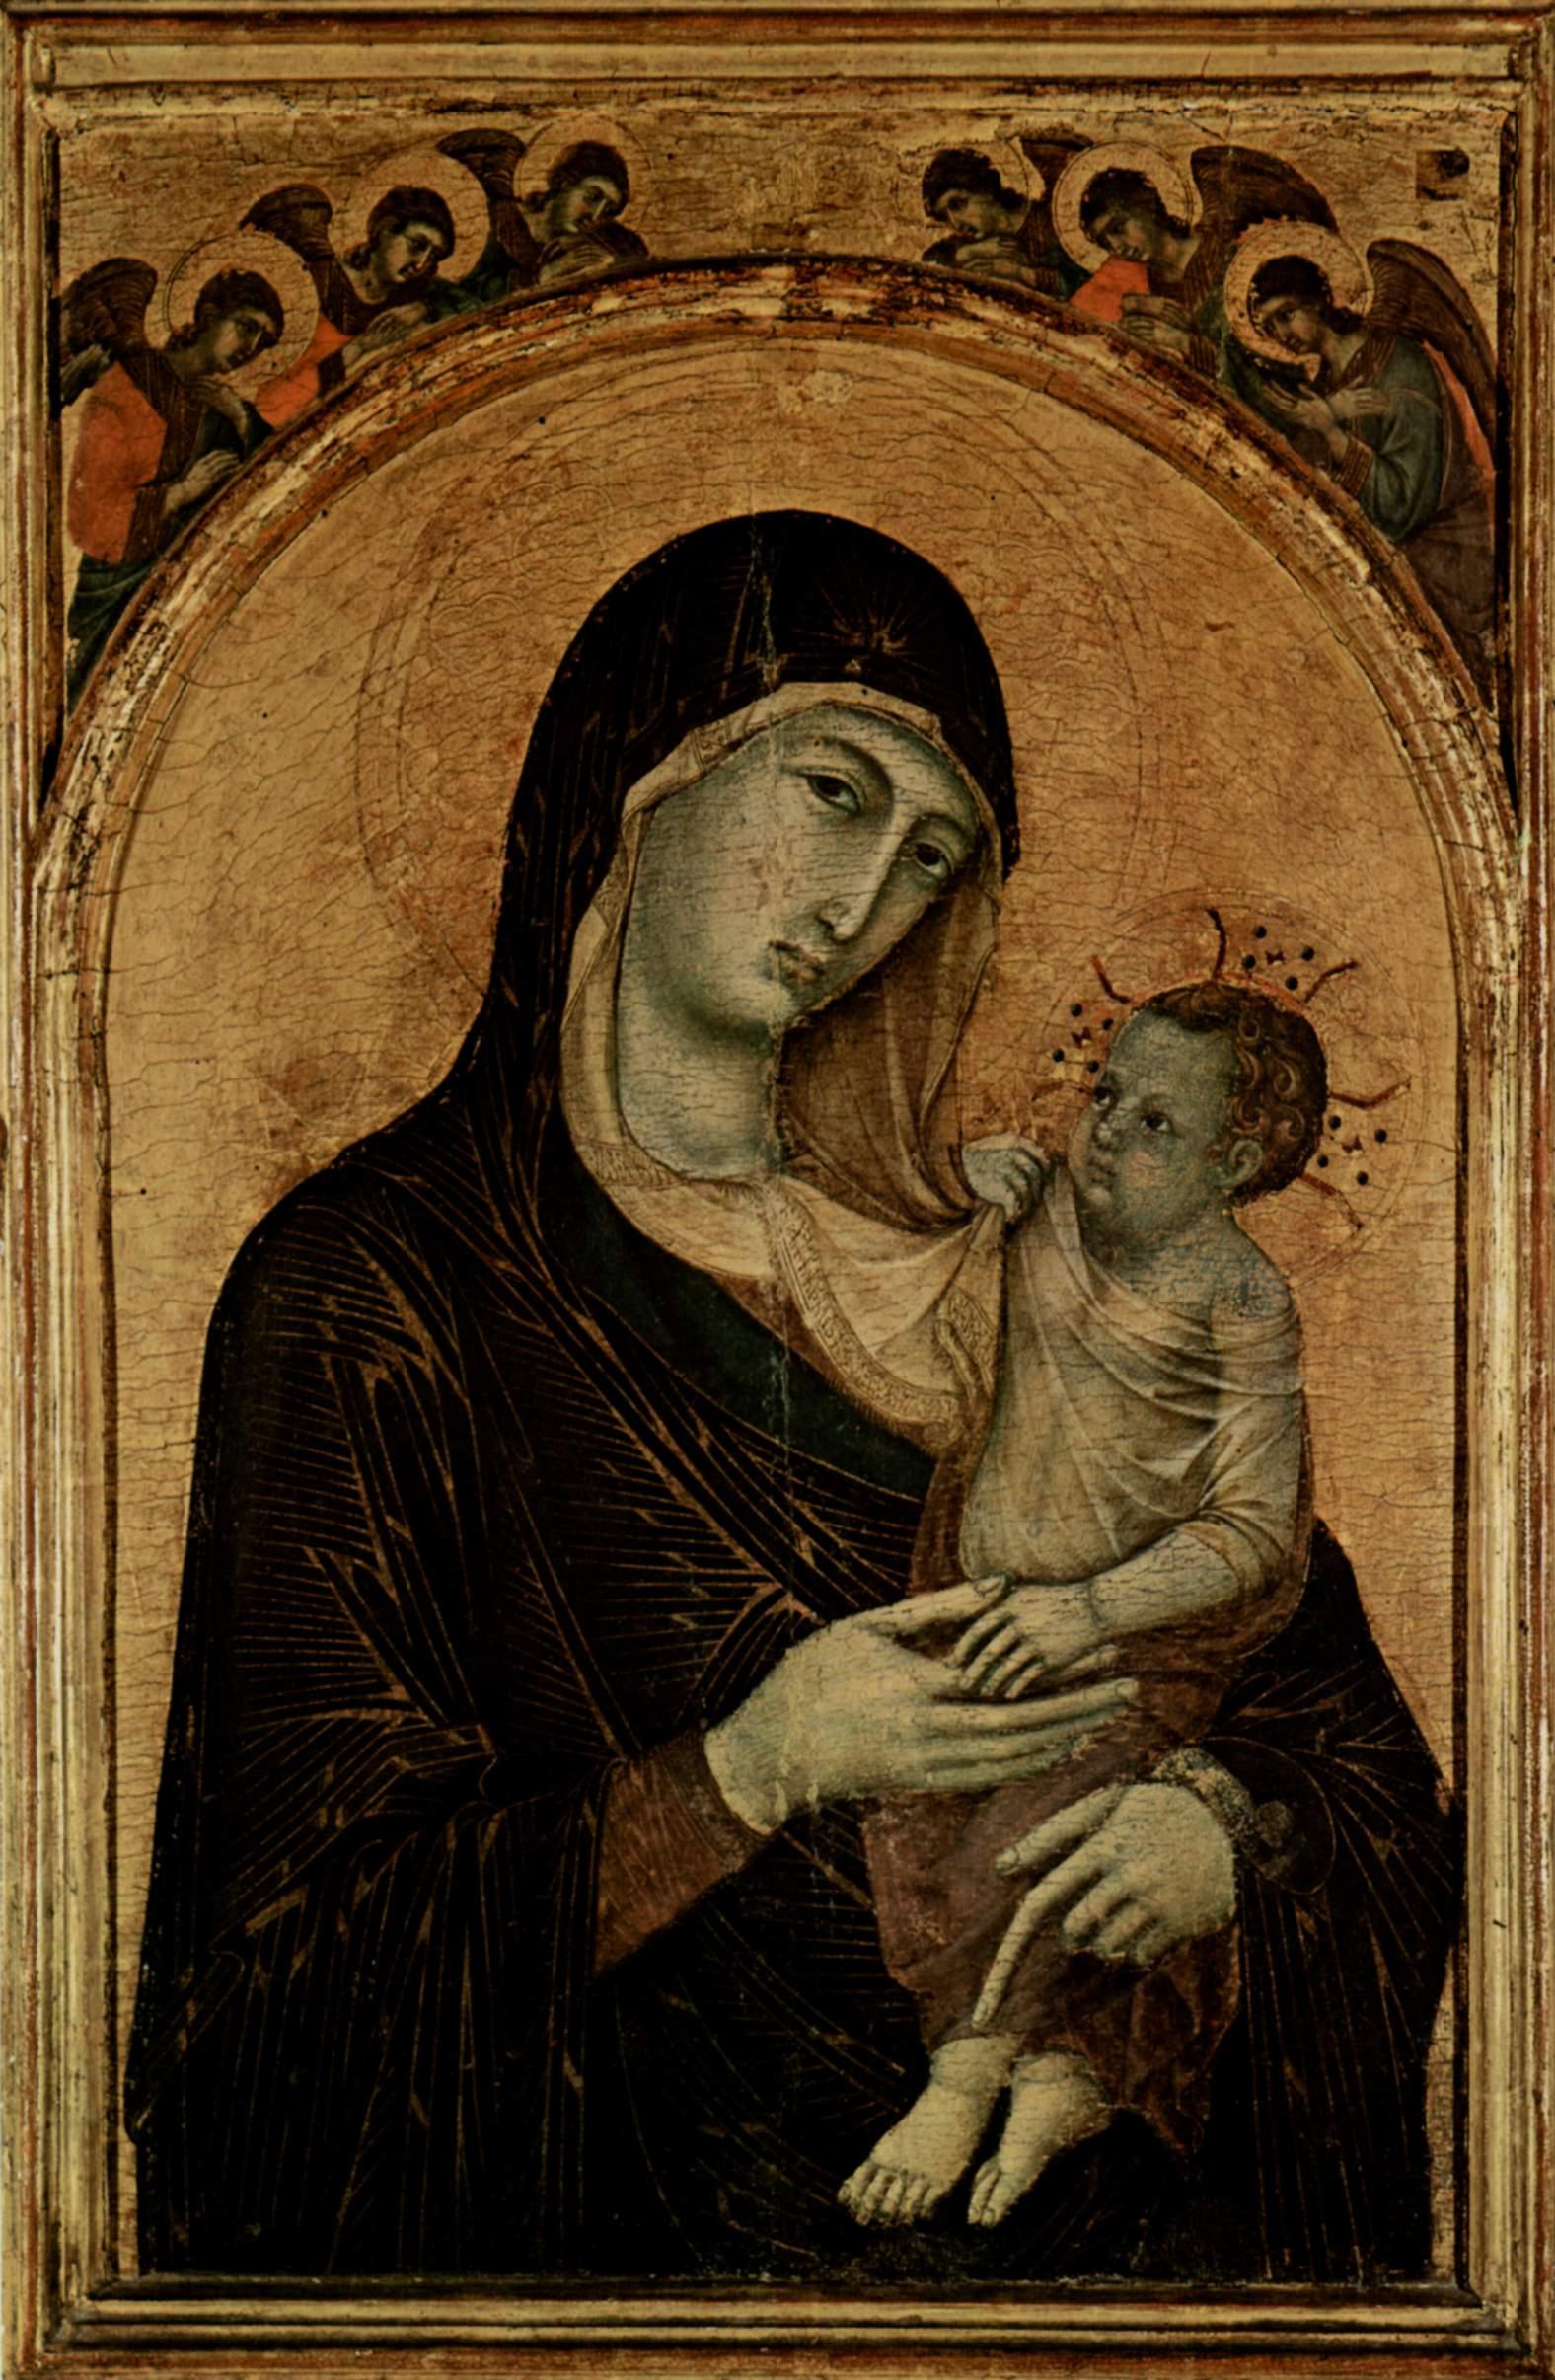 Madonna date of birth